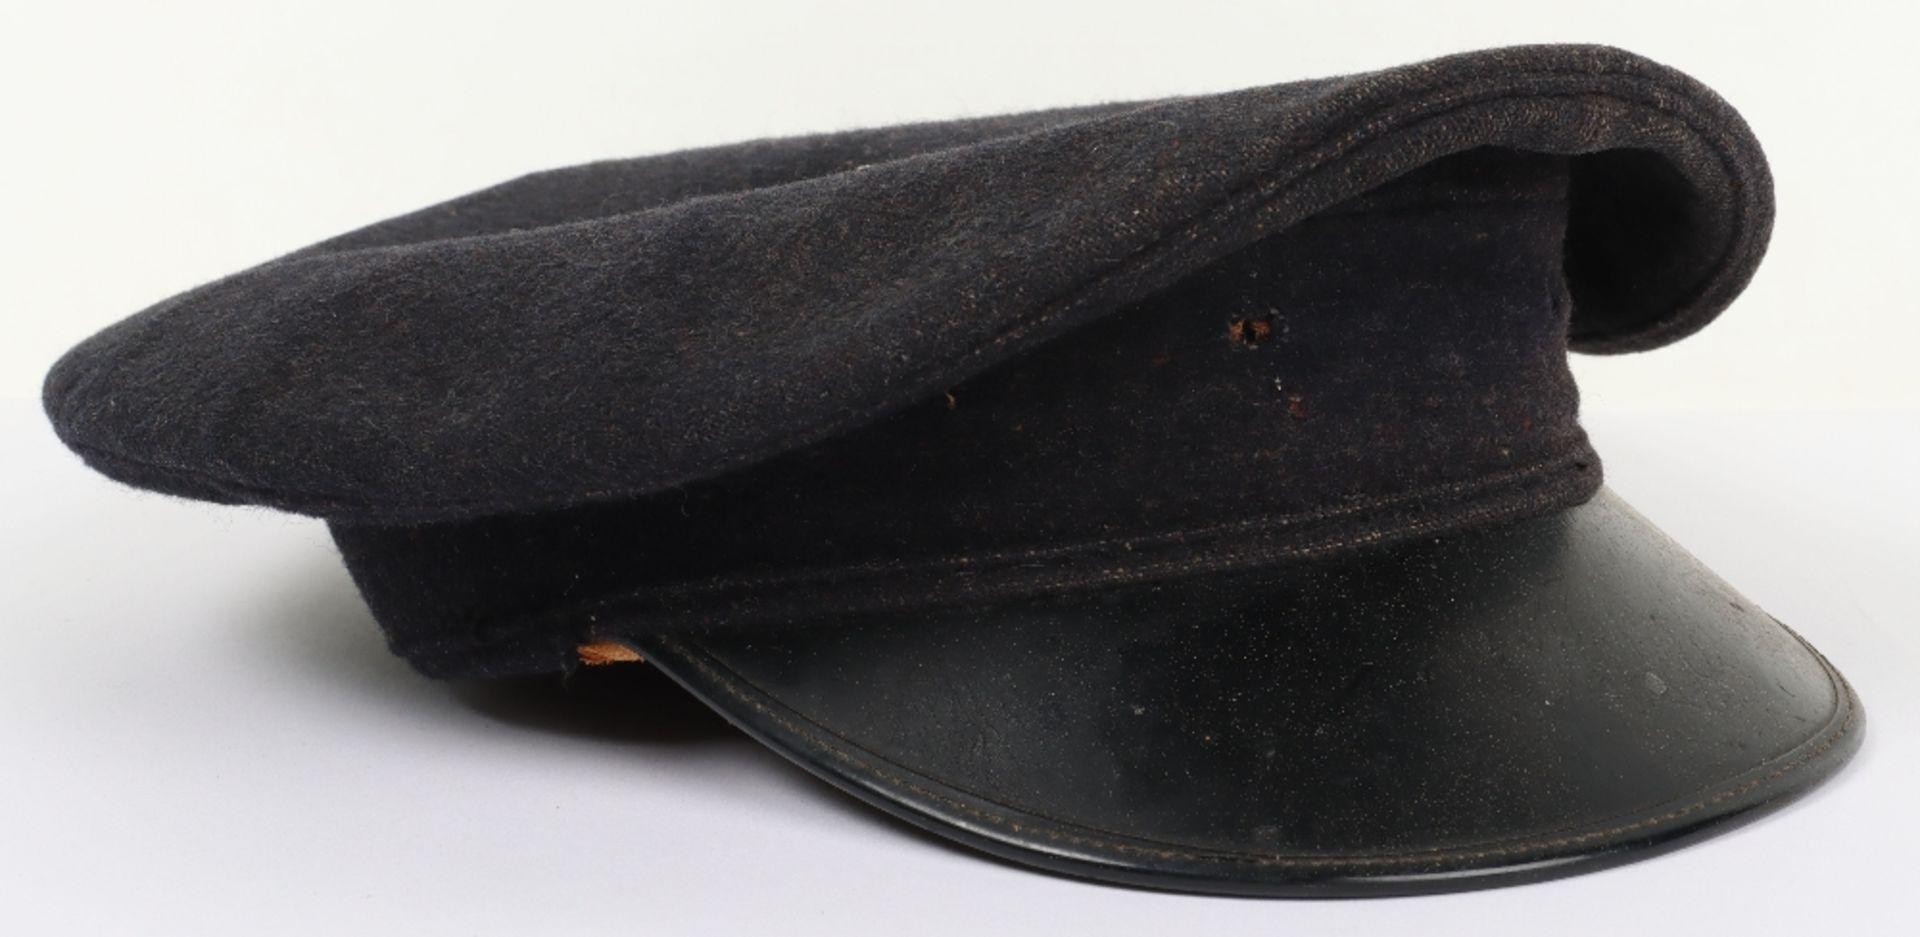 A London, Midland & Scottish and London North Eastern Railway porter's jacket, circa 1930 - Image 9 of 13